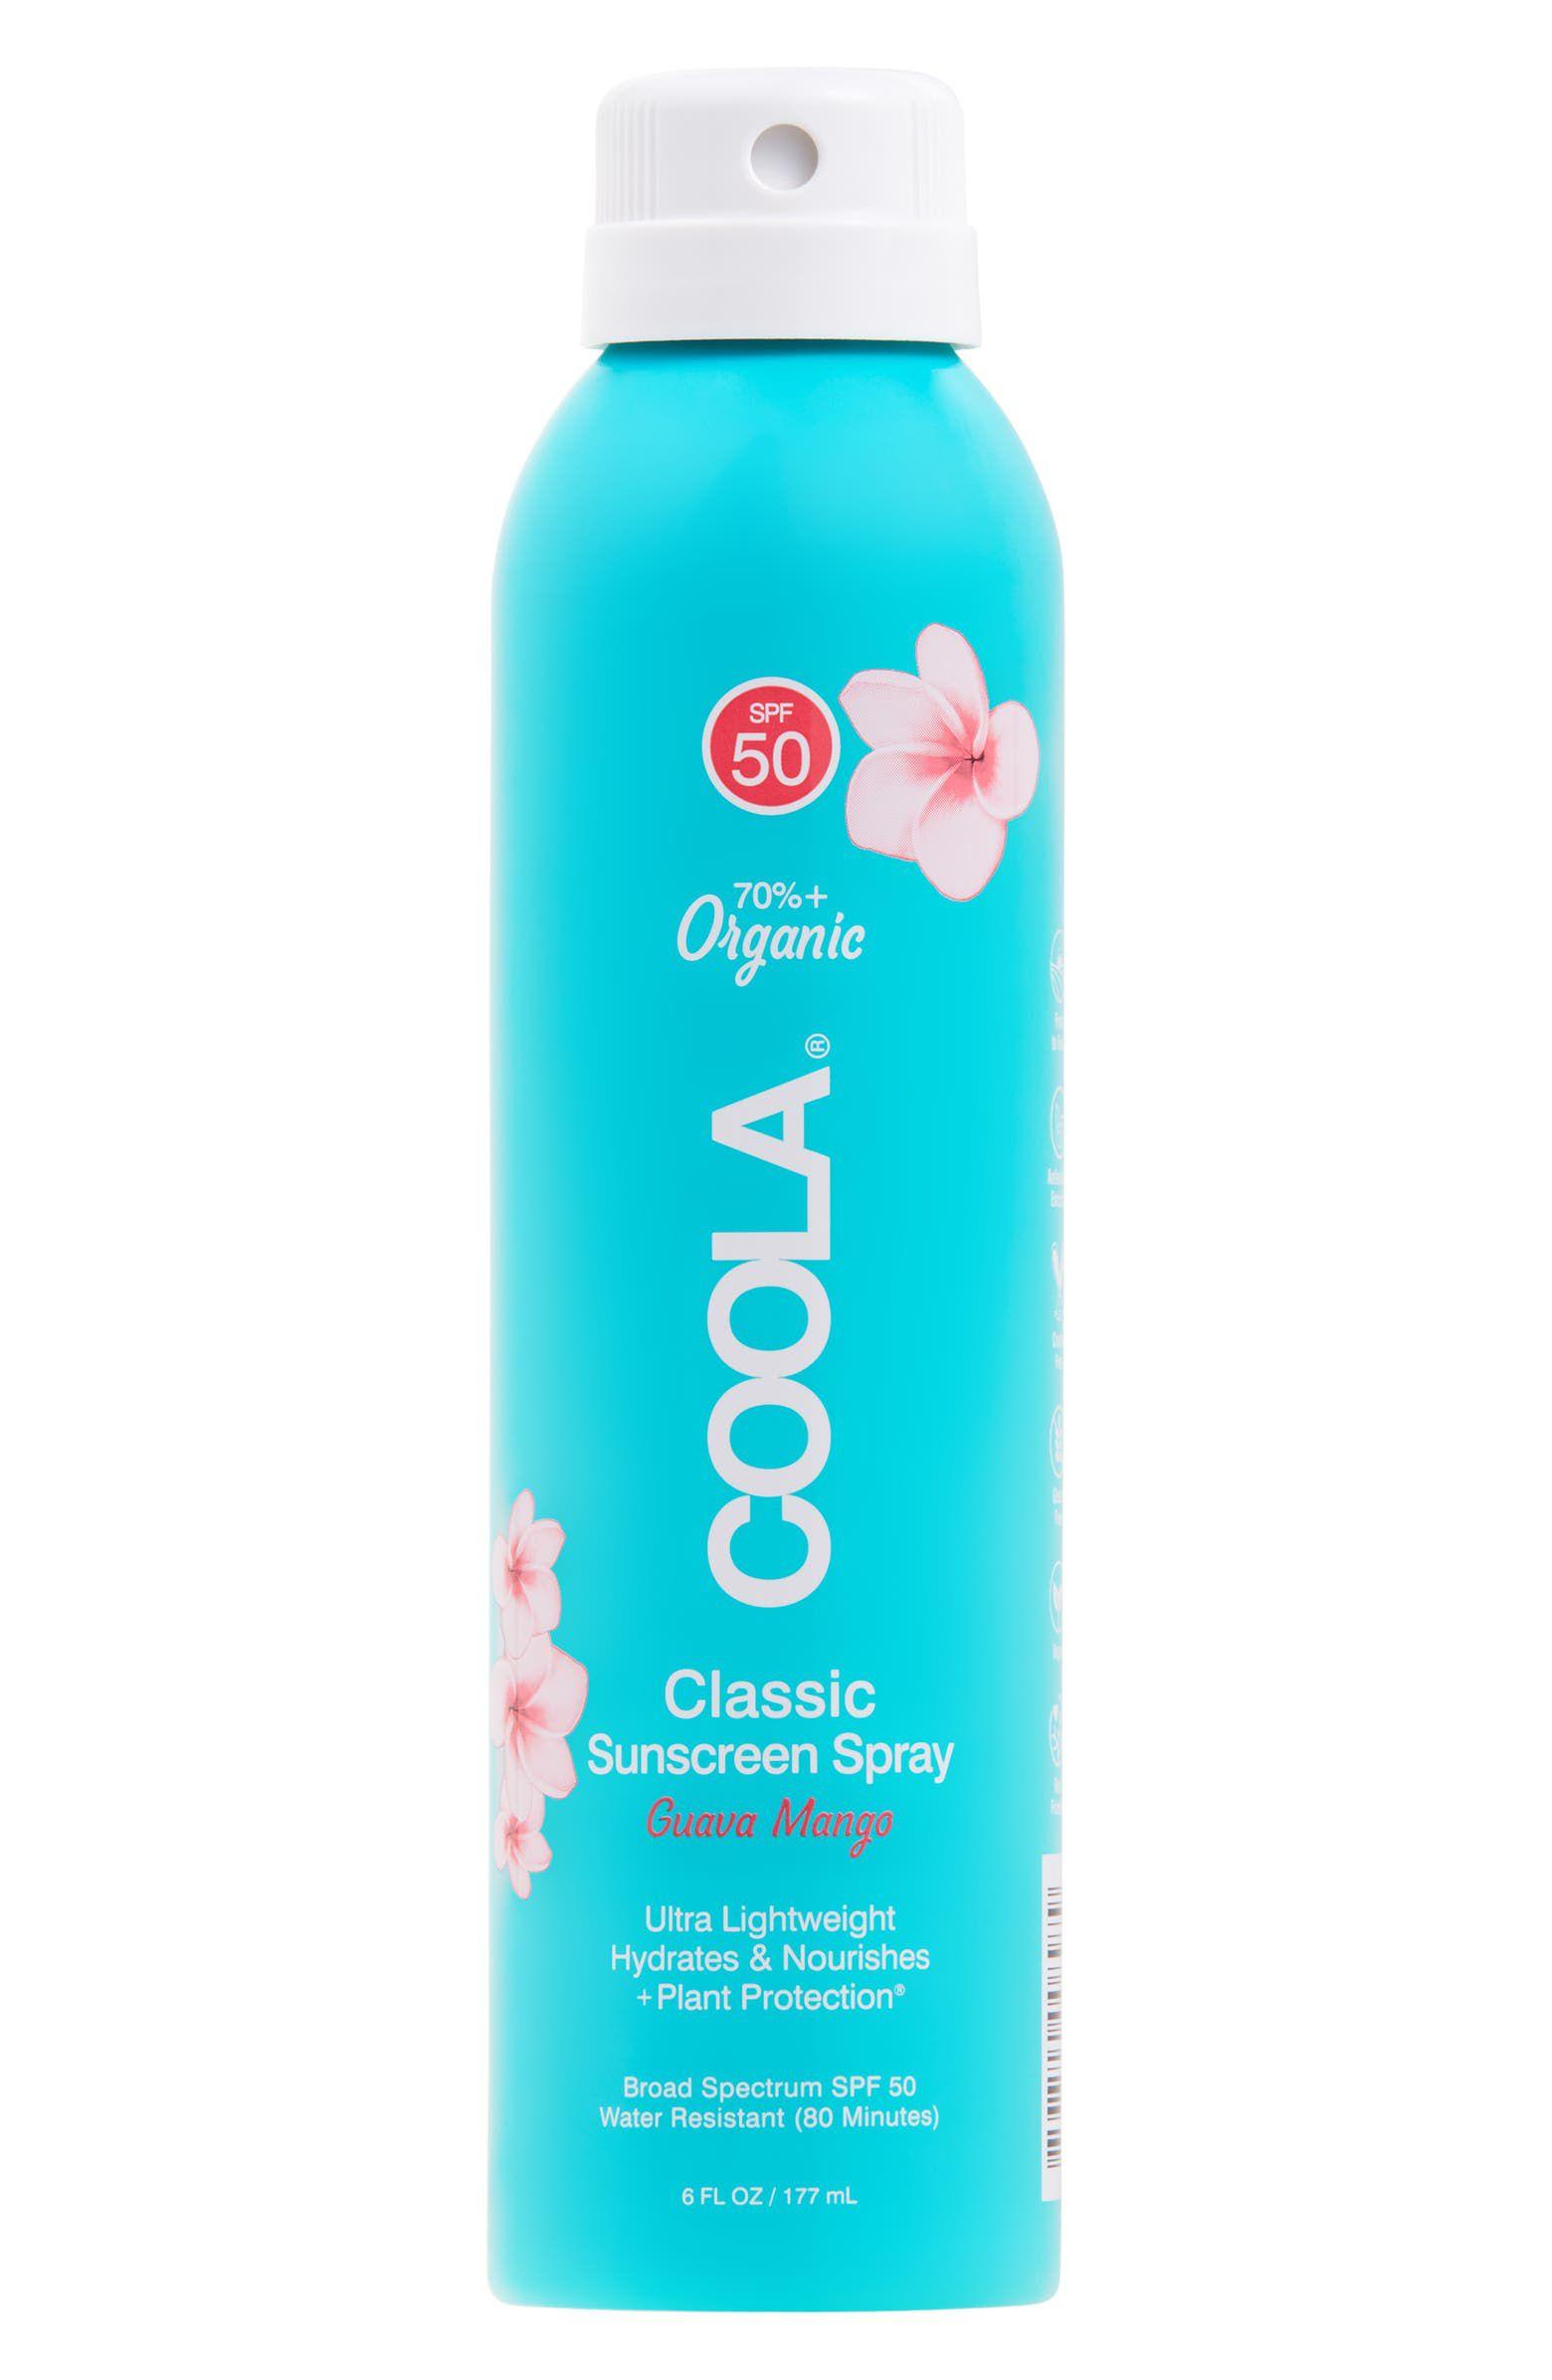 Coola Suncare Guava Mango Eco-Lux Sport Sunscreen Spray SPF 50q